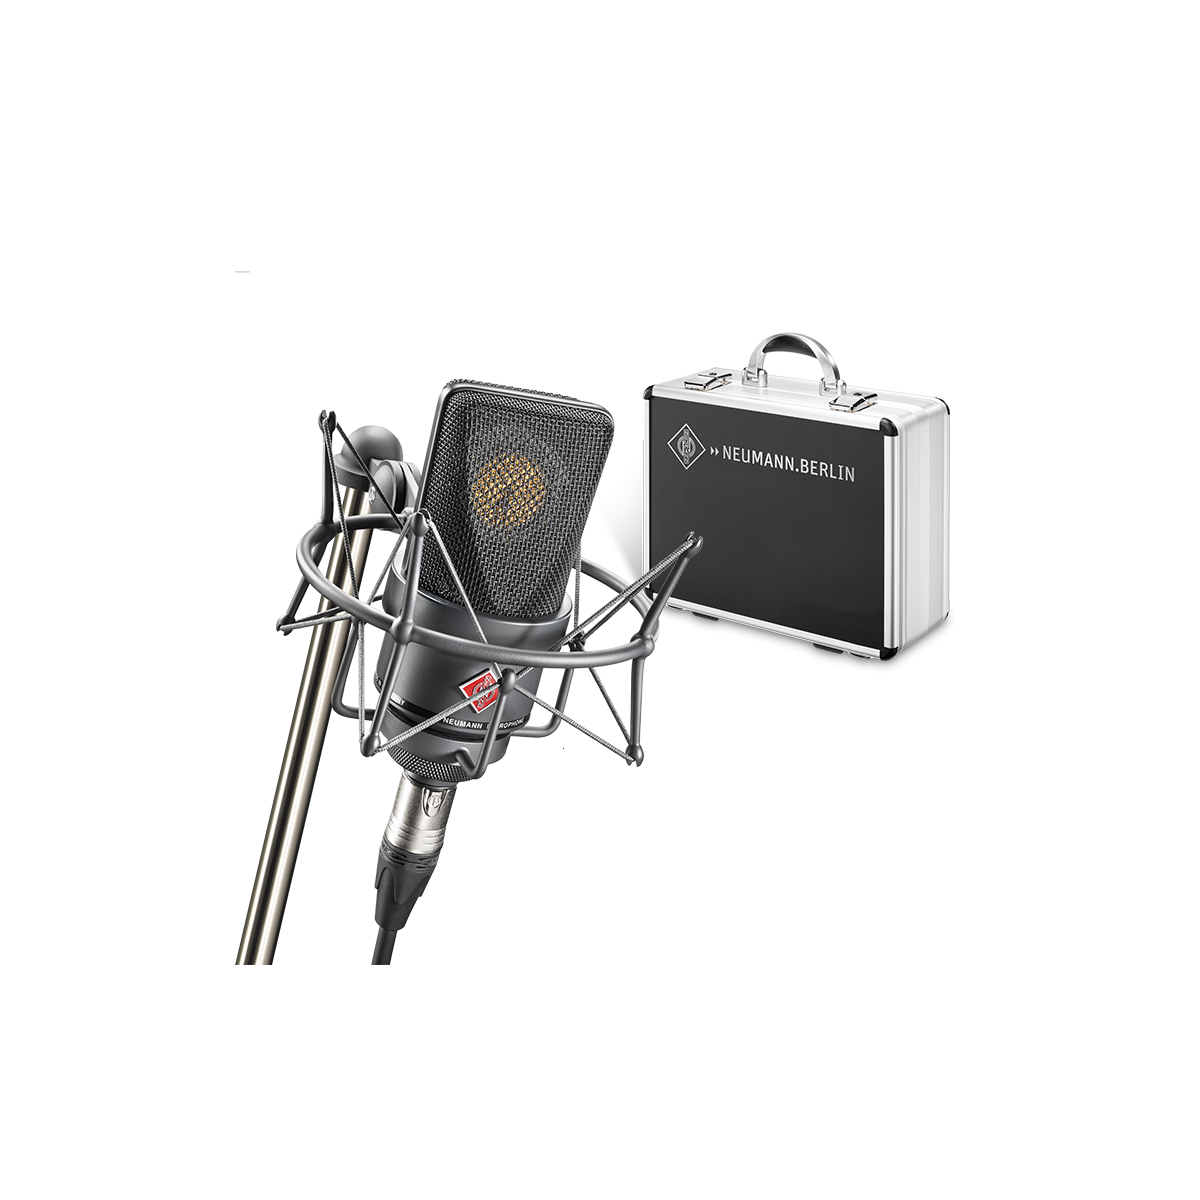 Micros studio - Neumann - TLM 103 MT Mono Set